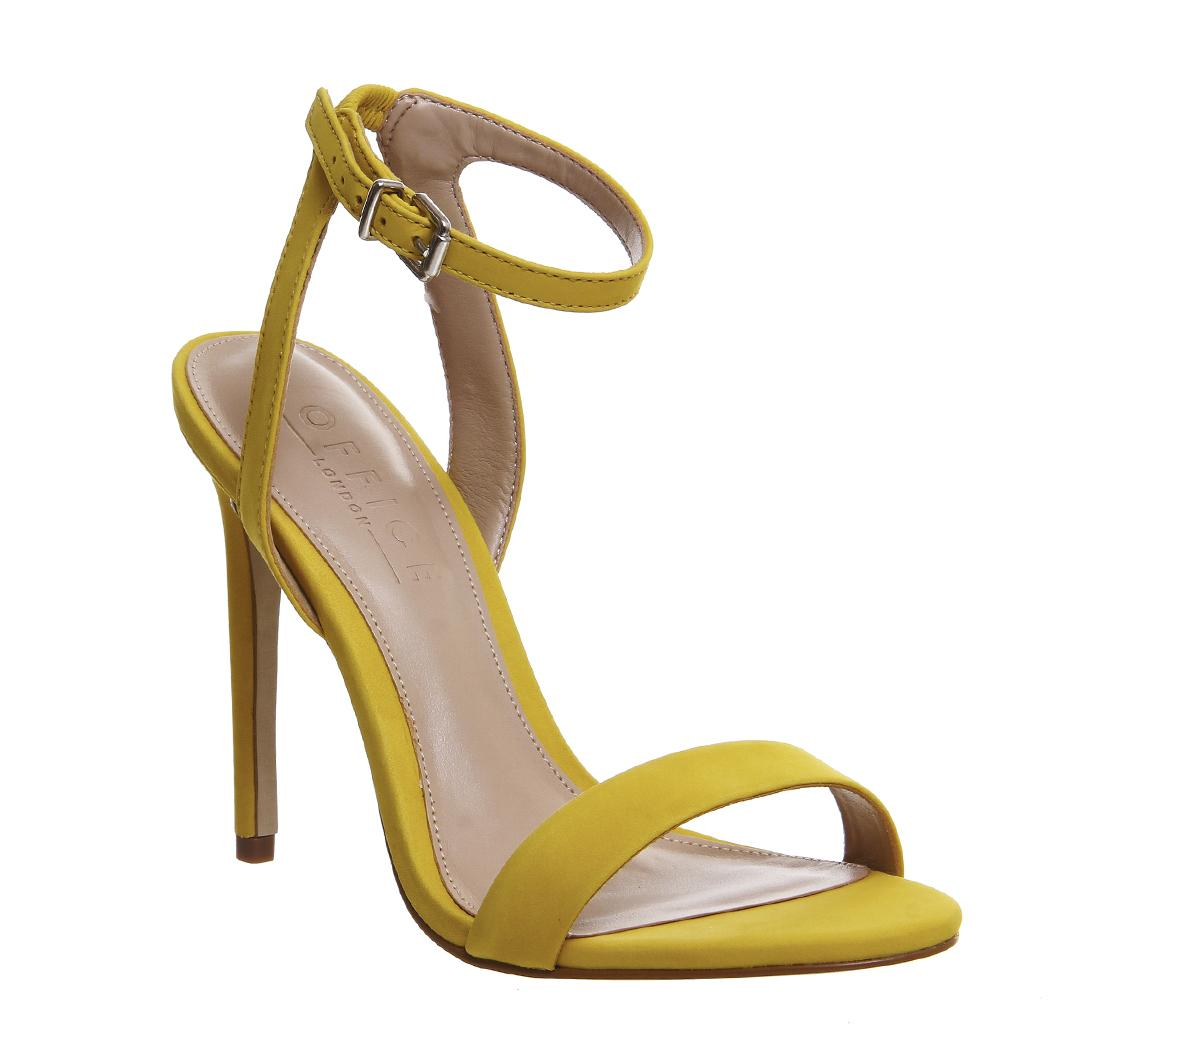 Alana Single Sole Sandal